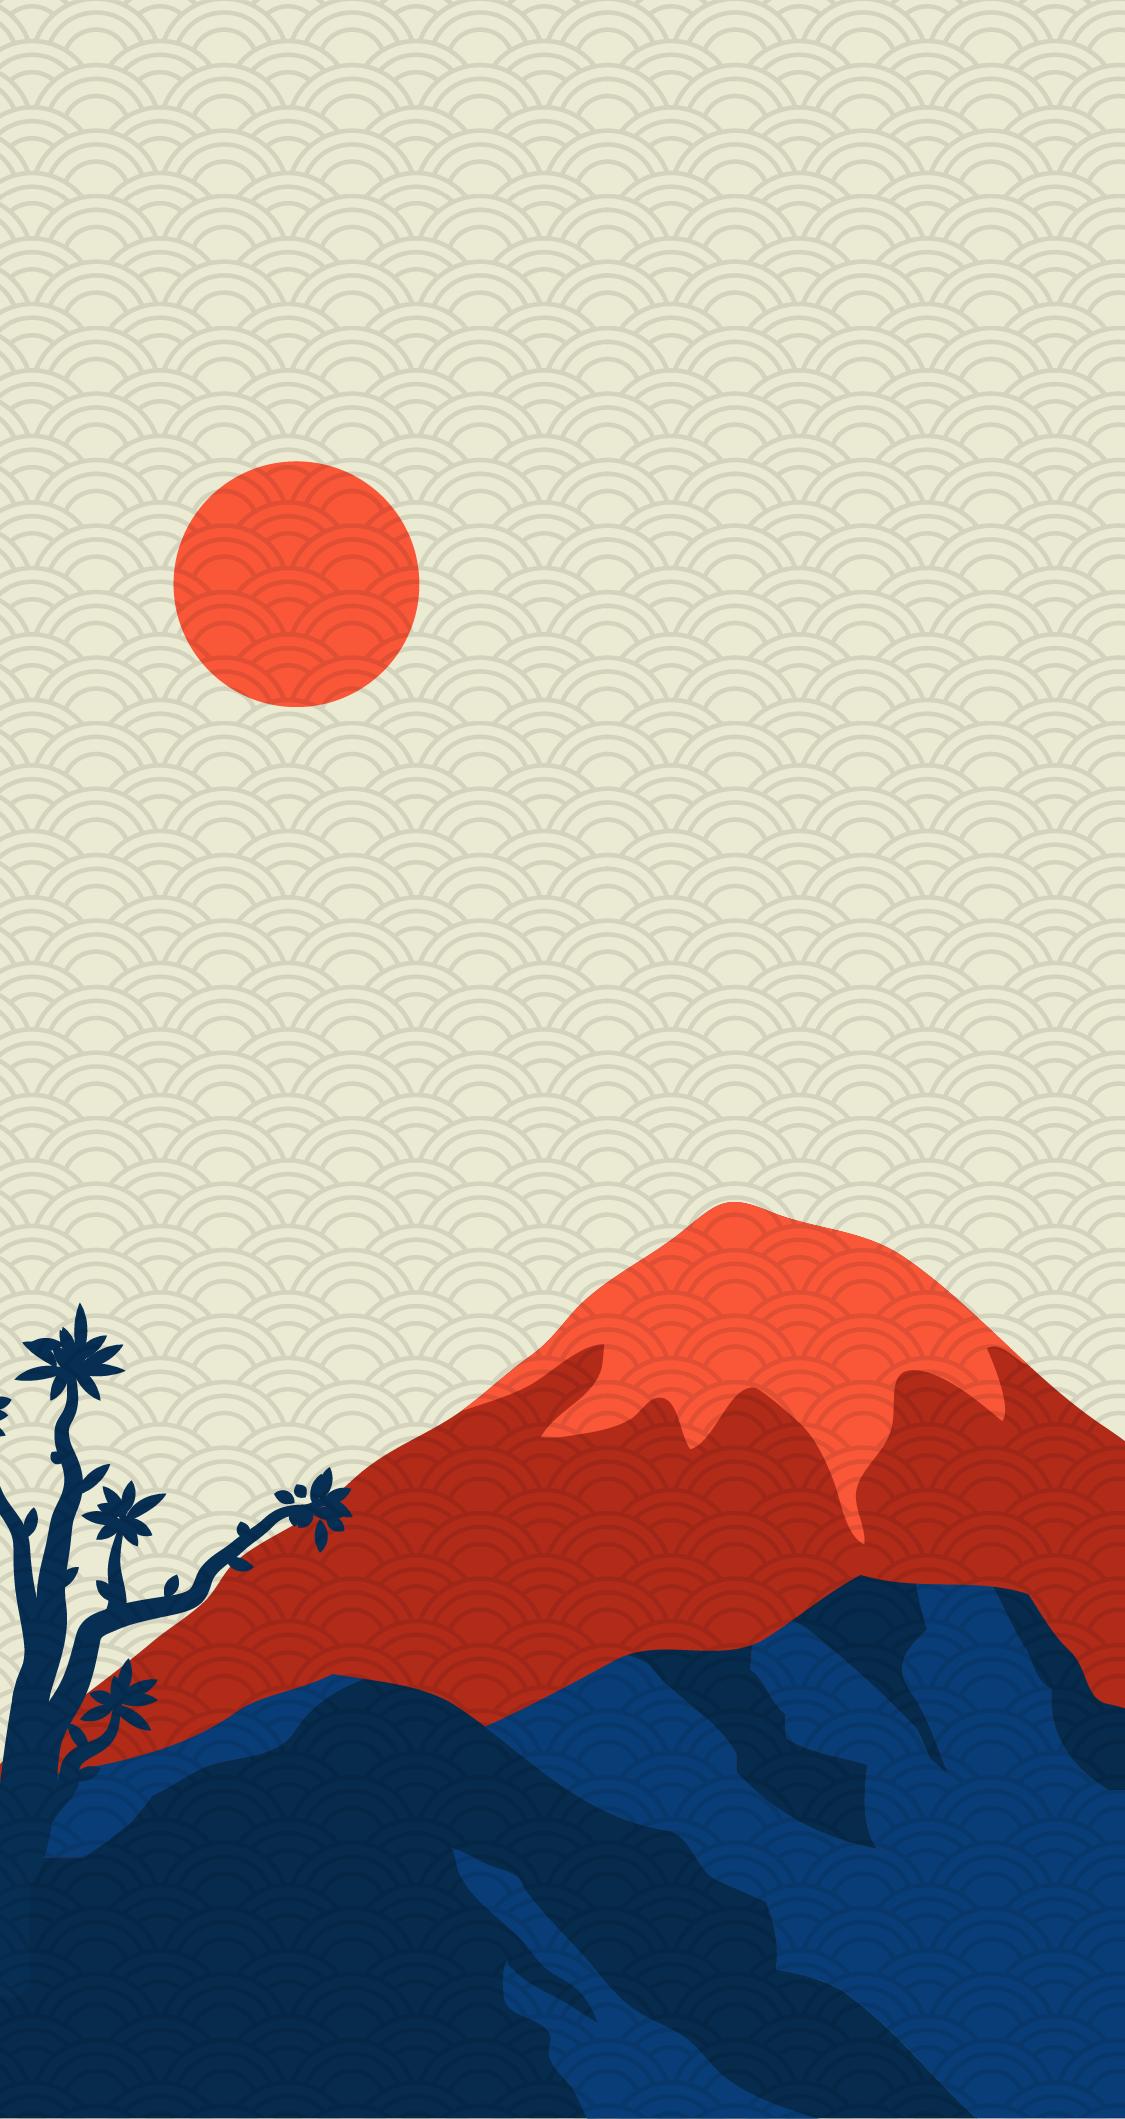 Welcometojapan Shop Redbubble Japanese Wallpaper Iphone Art Wallpaper Iphone Xiaomi Wallpapers